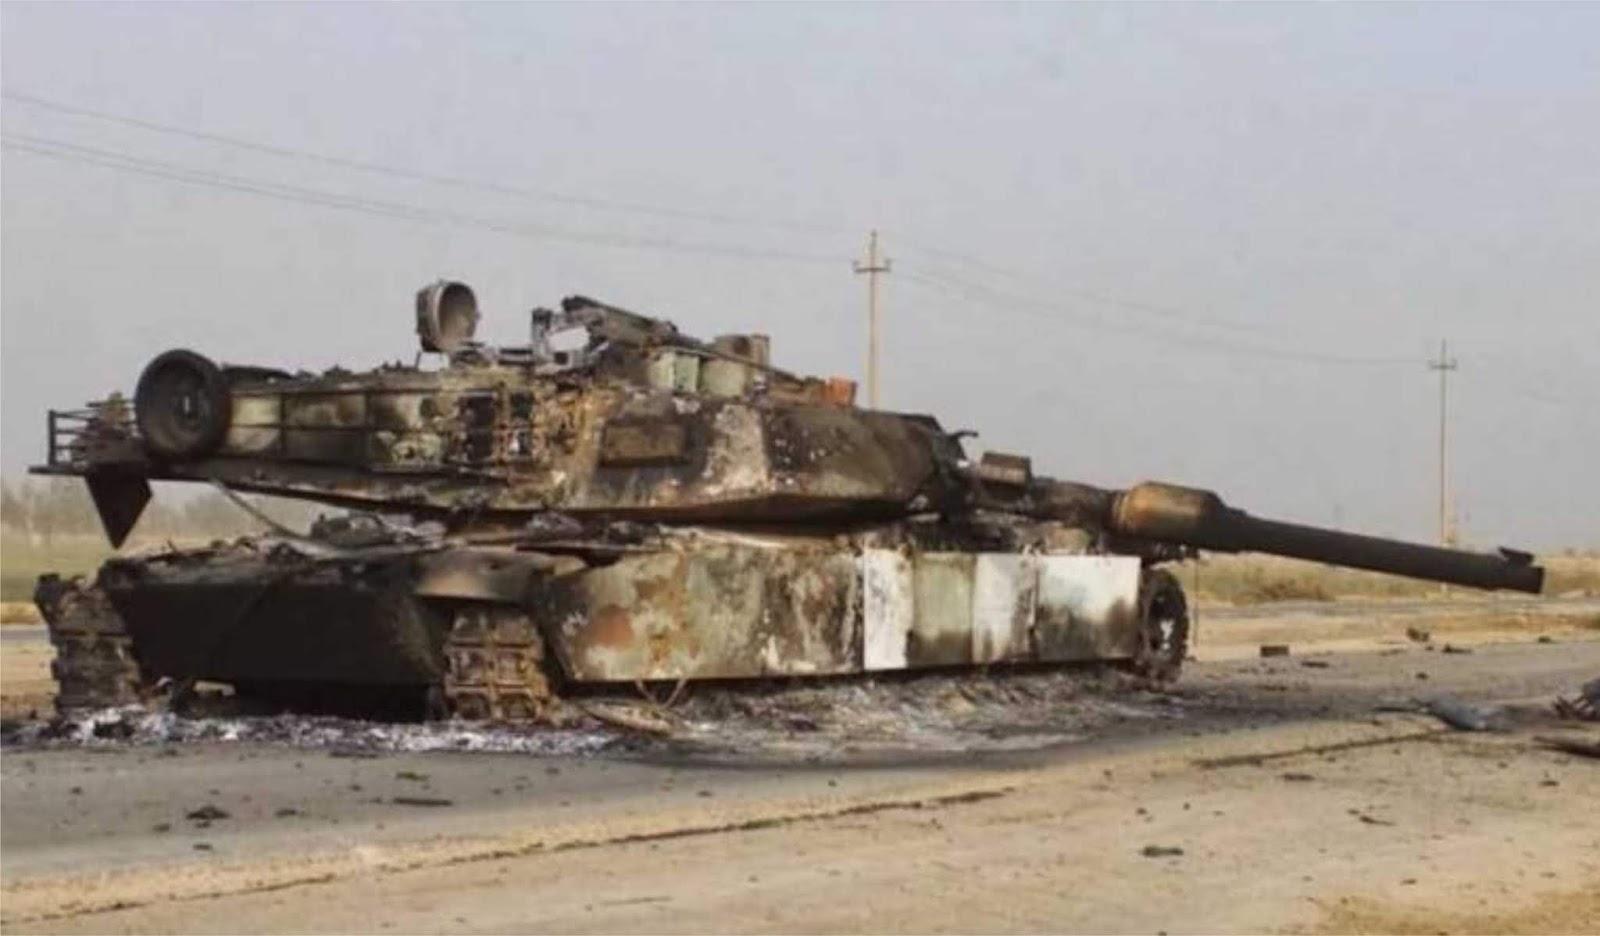 Perang di Yaman menunjukkan ketidakefektifan taktik lama serangan tank